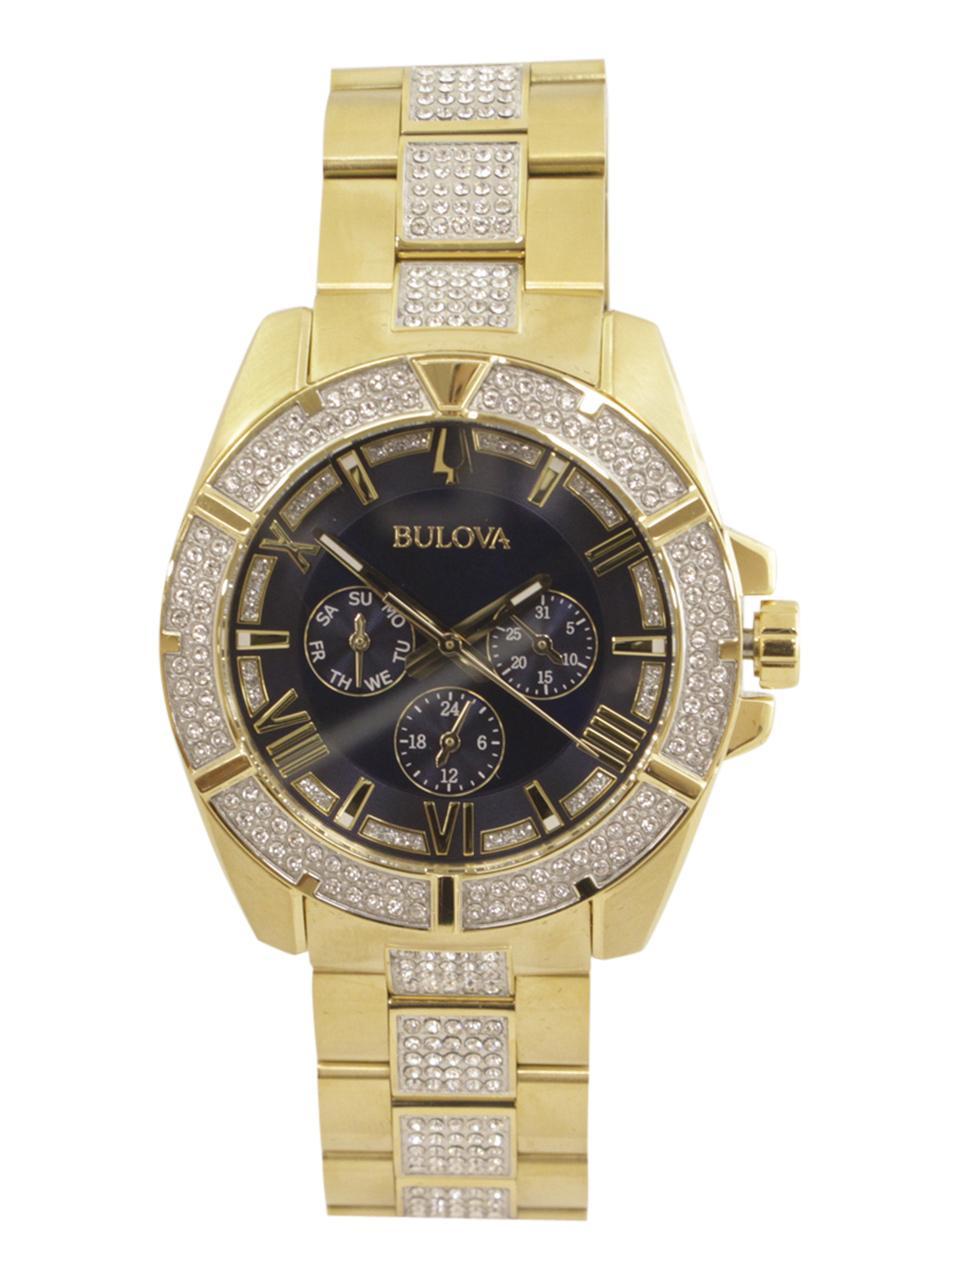 Image of Bulova Octava 98C128 Two Tone Gold Silver Swarovski Chronograph Analog Watch